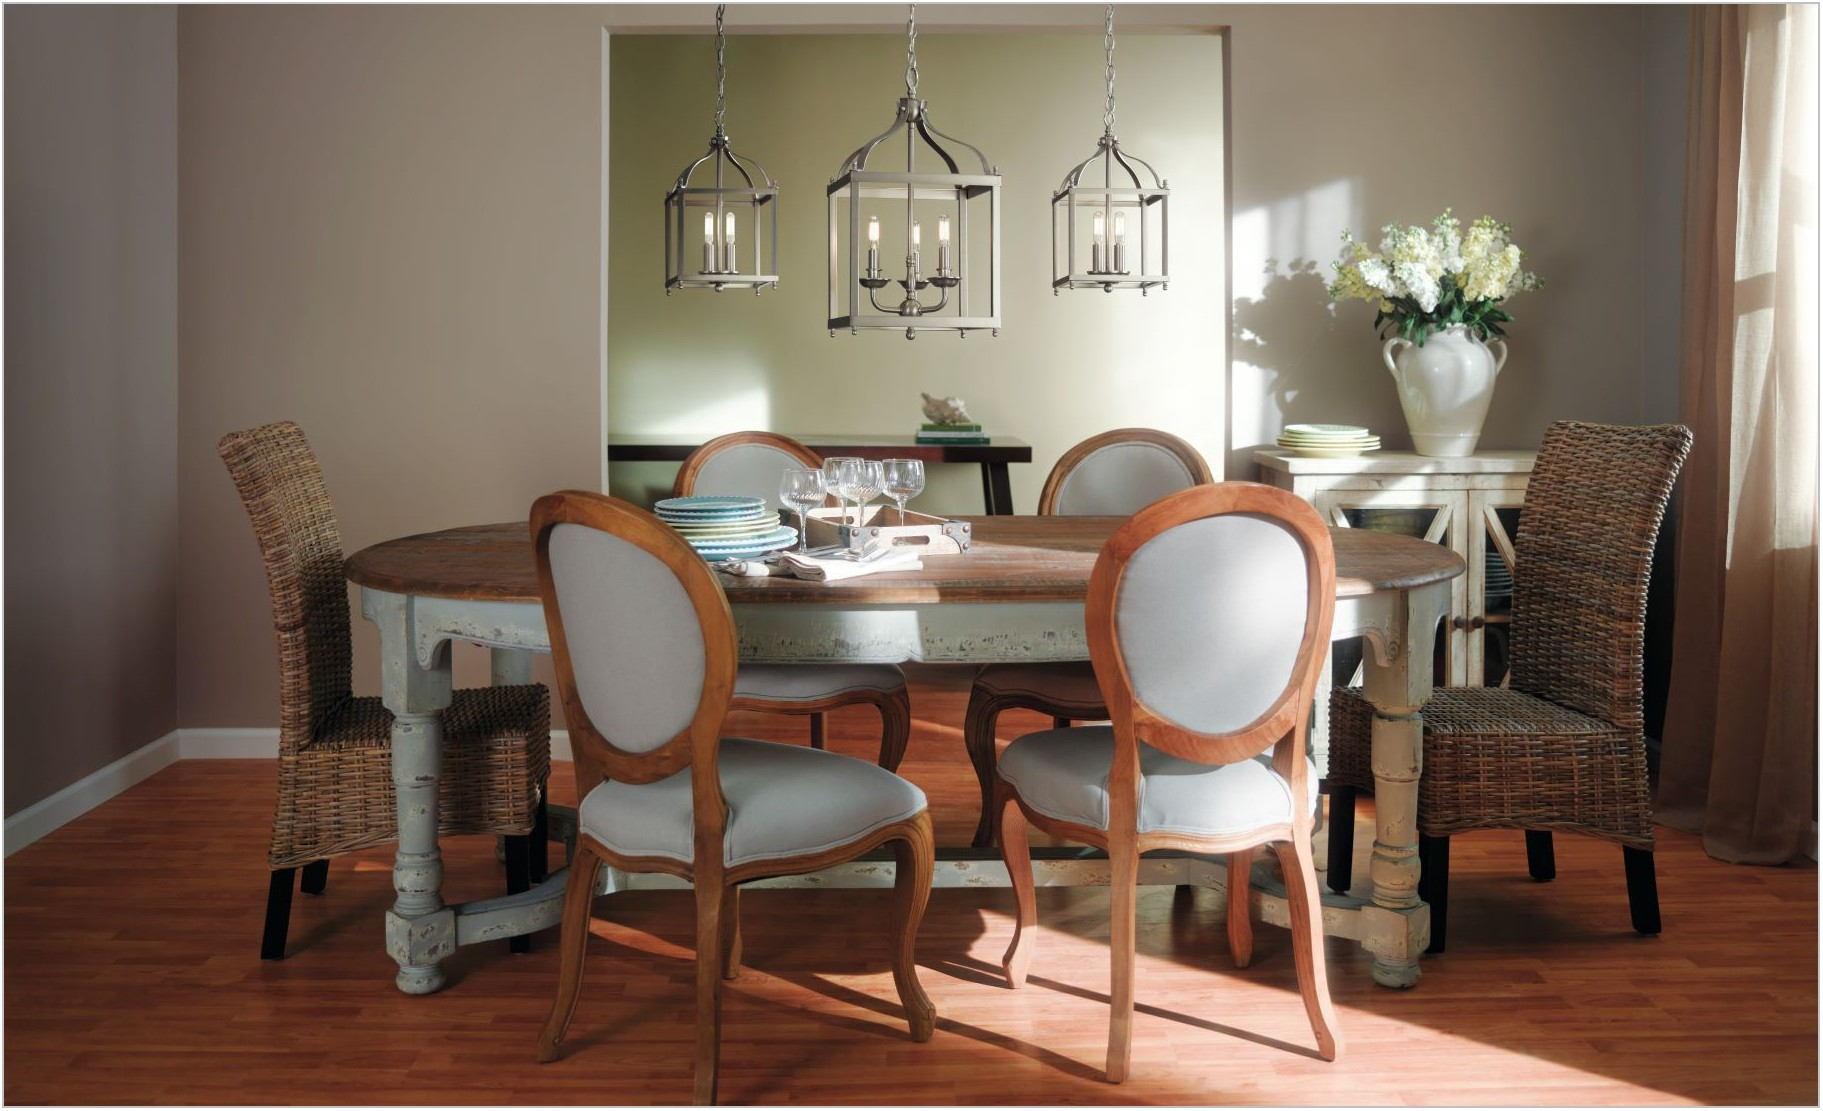 Kichler Dining Room Lights